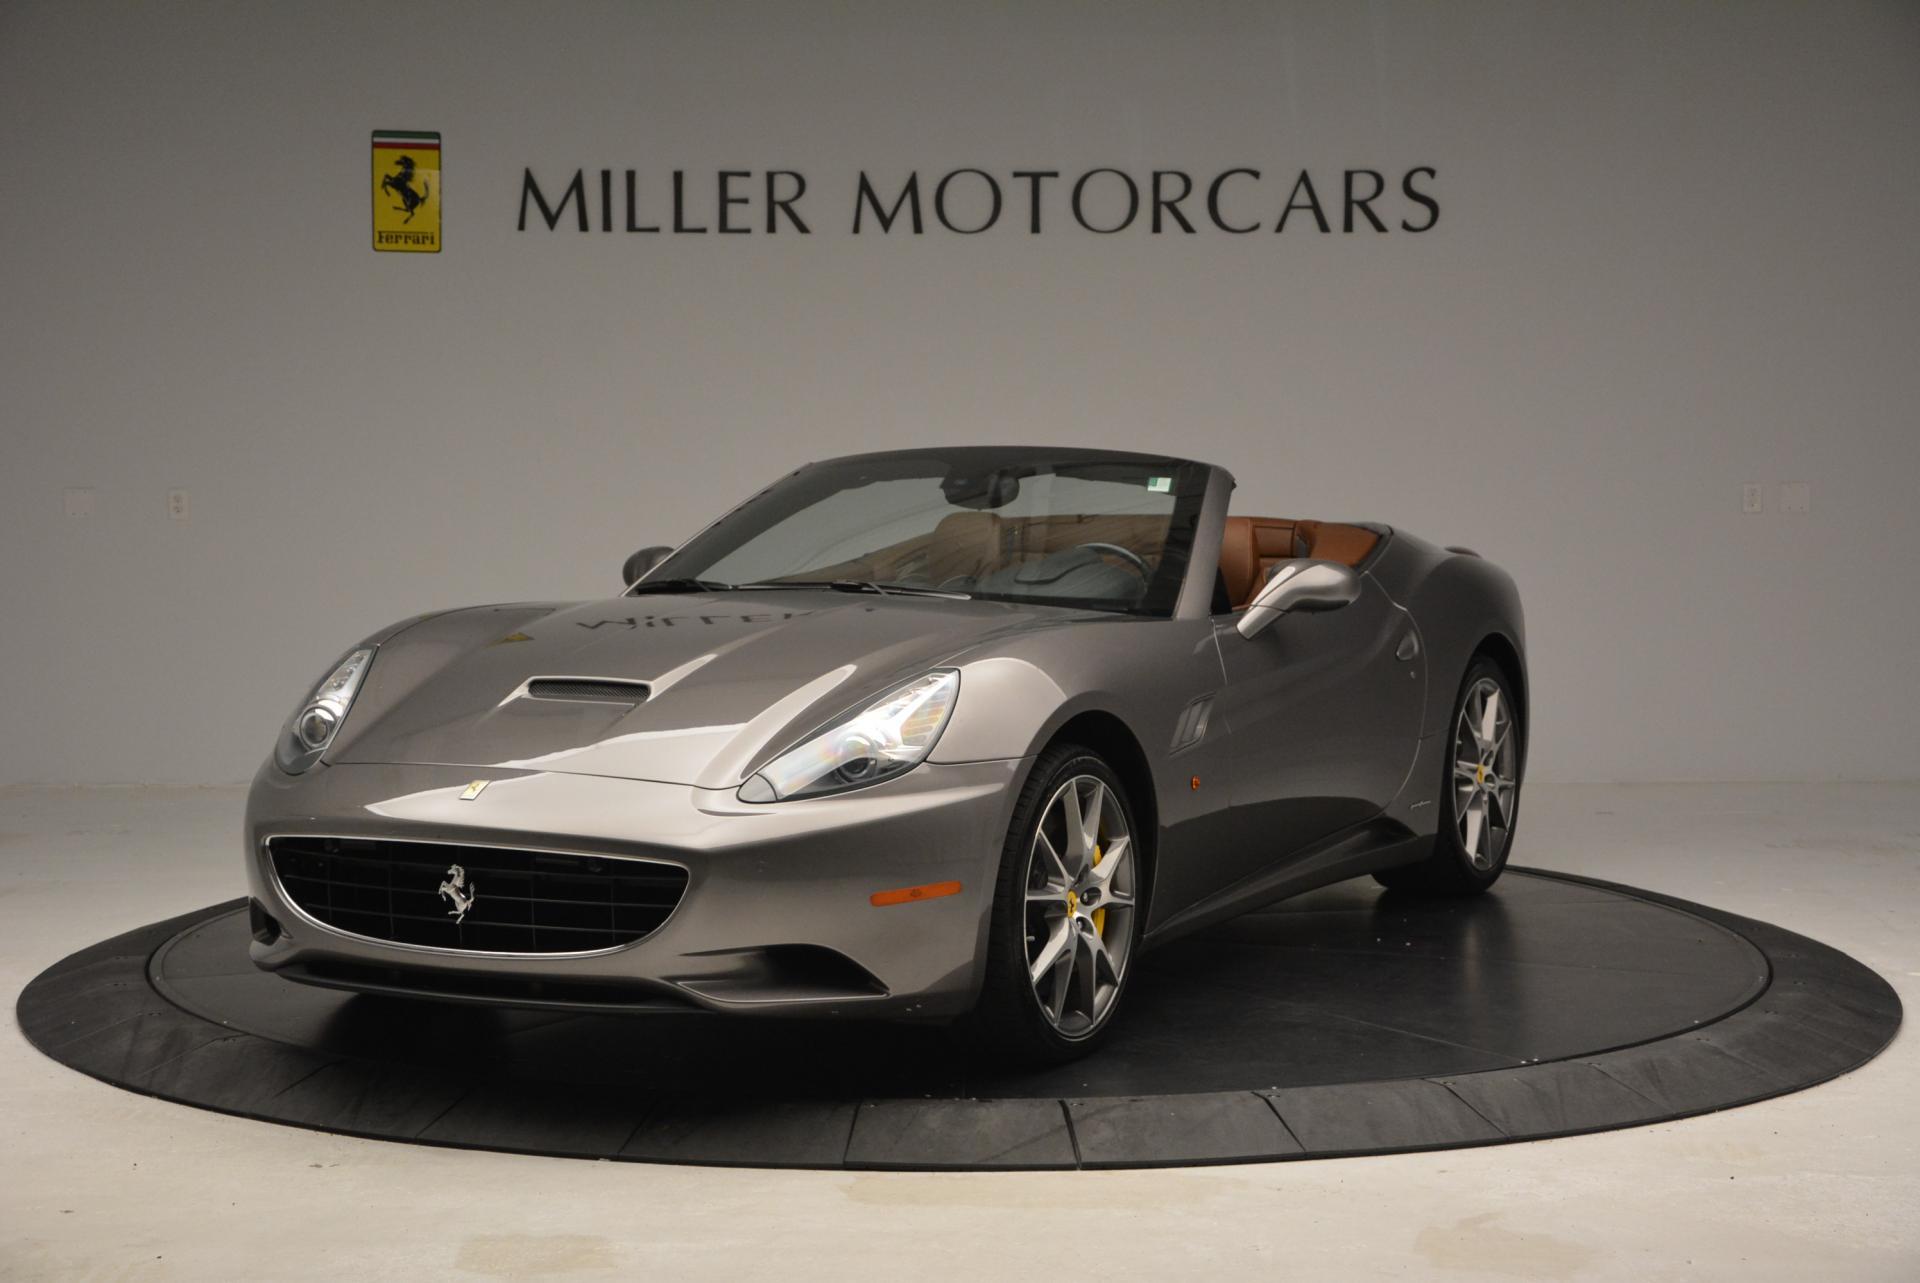 Used 2012 Ferrari California for sale Sold at Maserati of Greenwich in Greenwich CT 06830 1